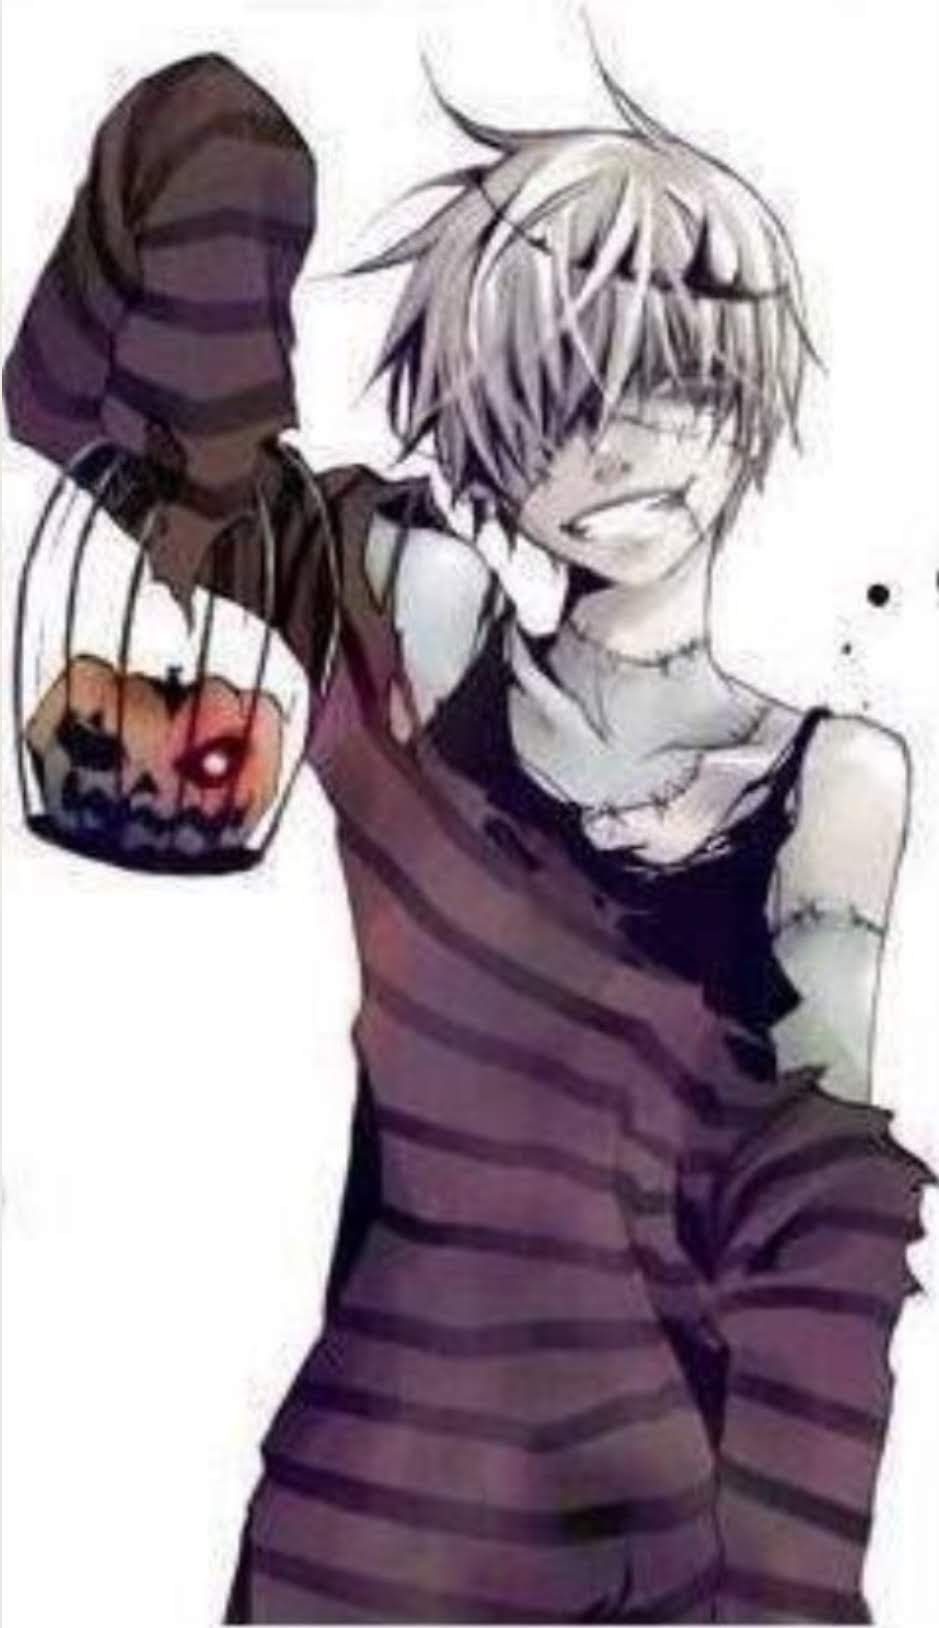 Pin By Kelsey Tveitbakk On The Chaos Saga Anime Halloween Anime Zombie Anime